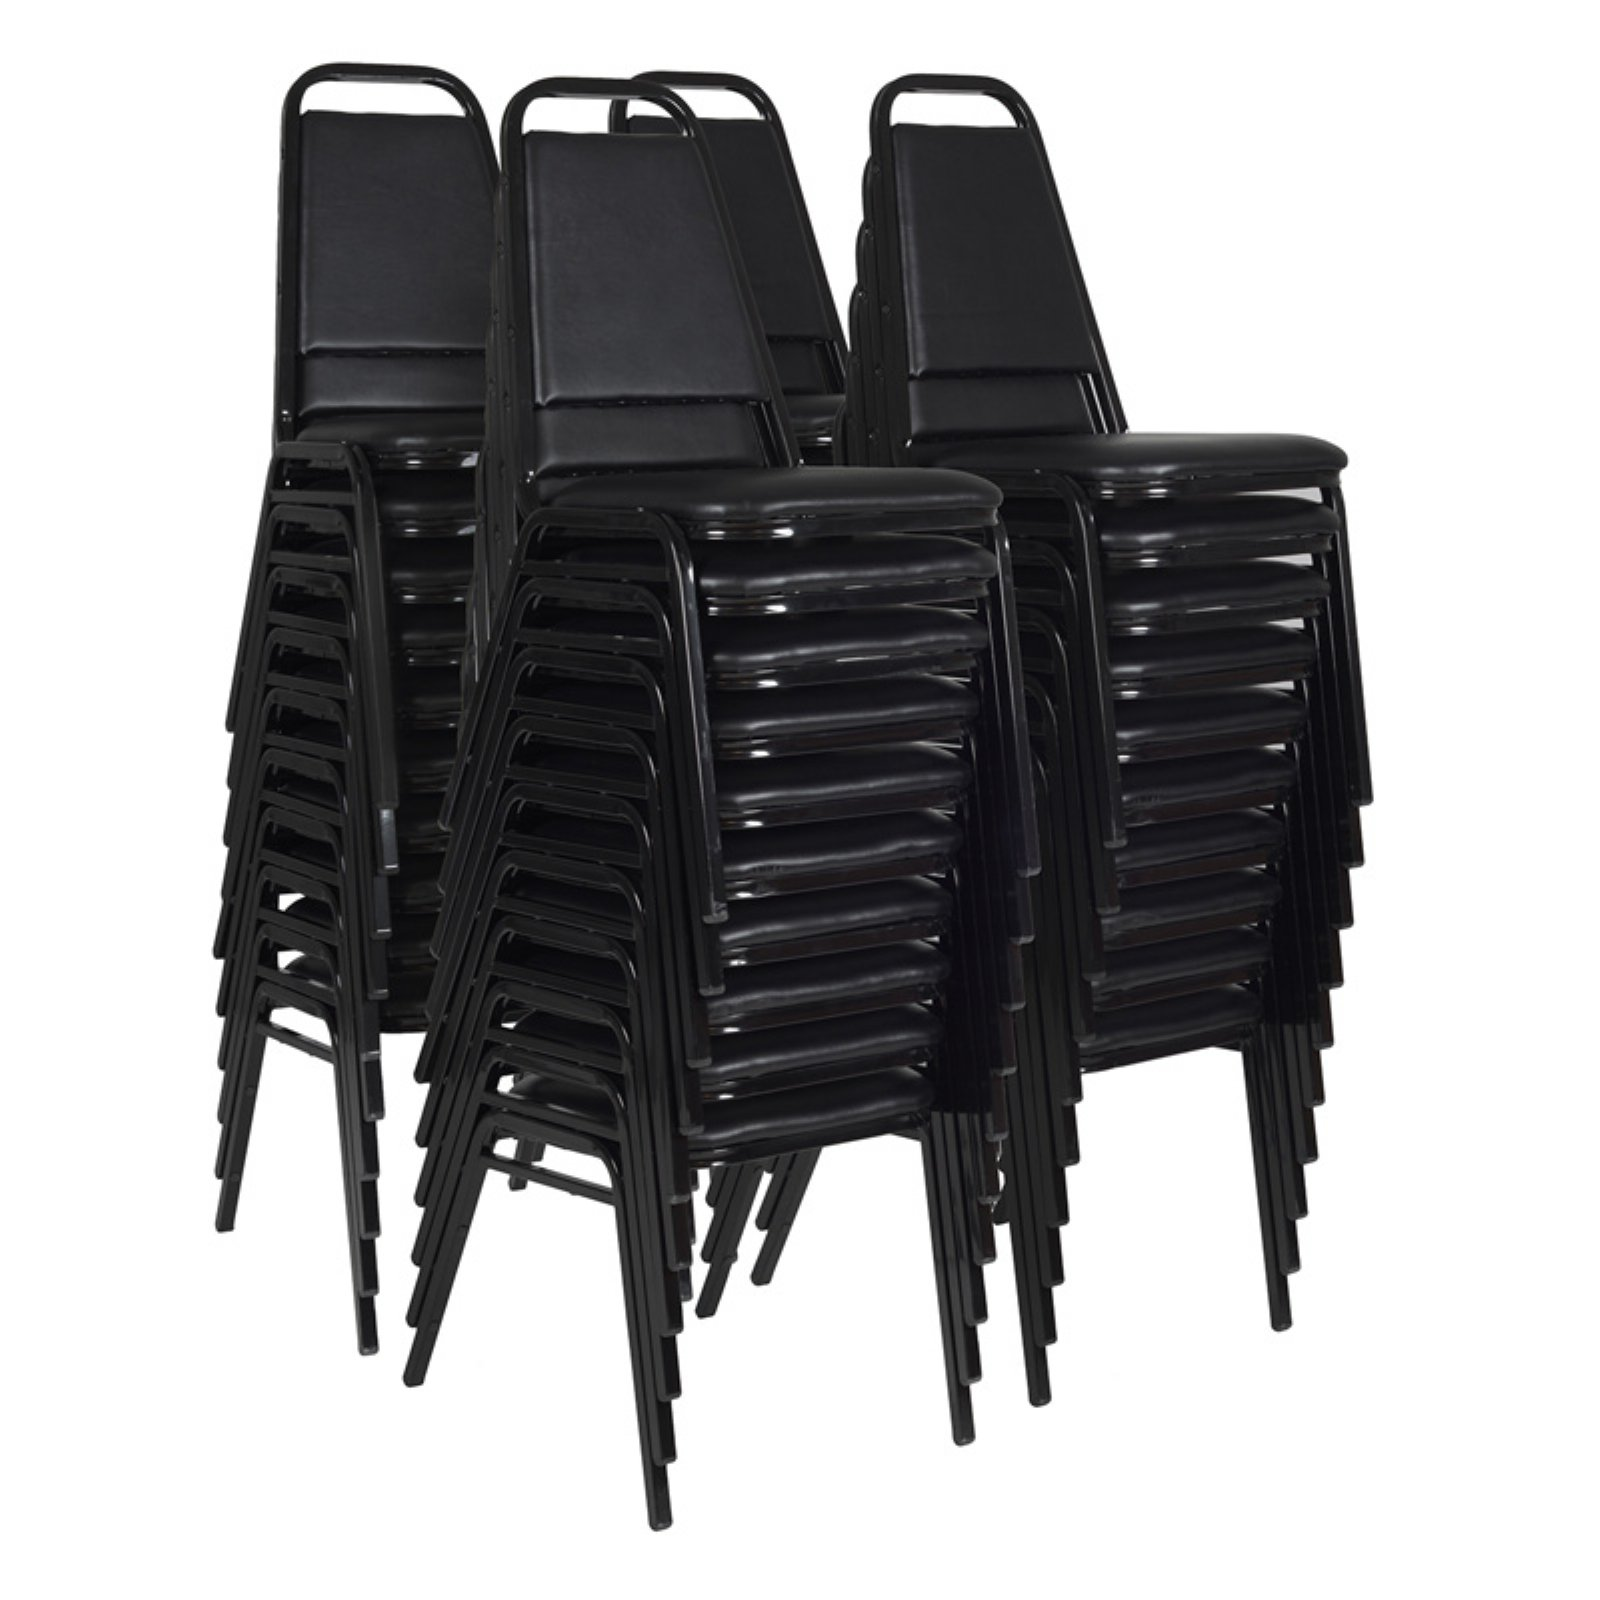 Regency Restaurant Stack Chairs, 40-pack